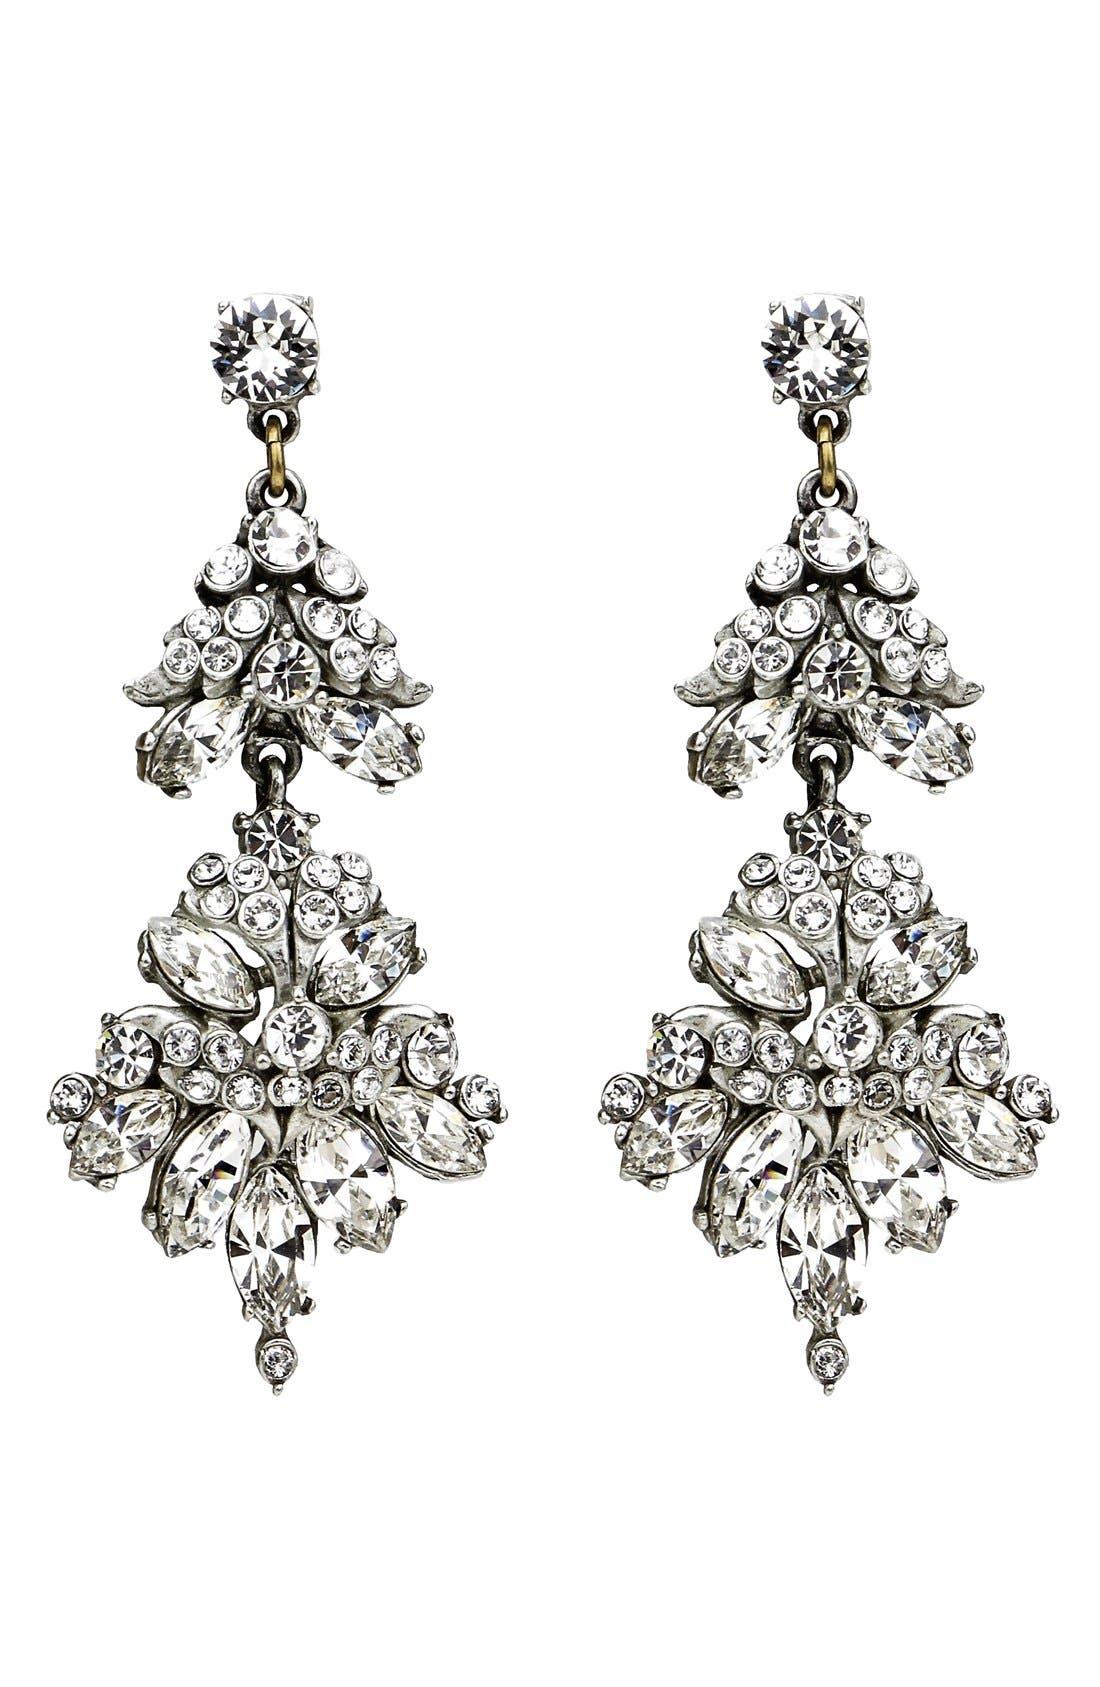 Alternate Image 1 Selected - Ben-Amun Crystal Statement Earrings